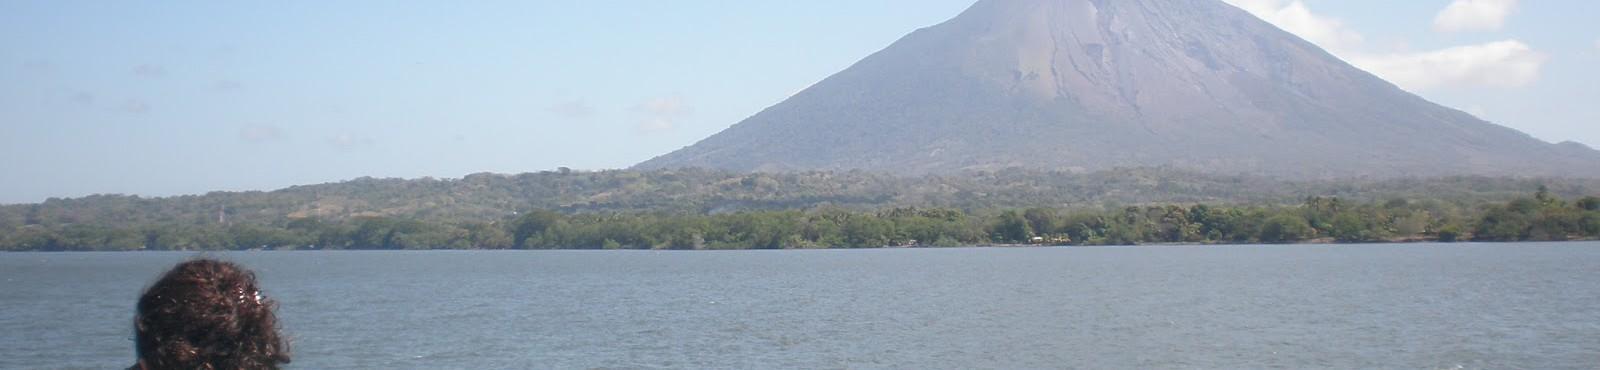 Nicaragua e Costarica 2010